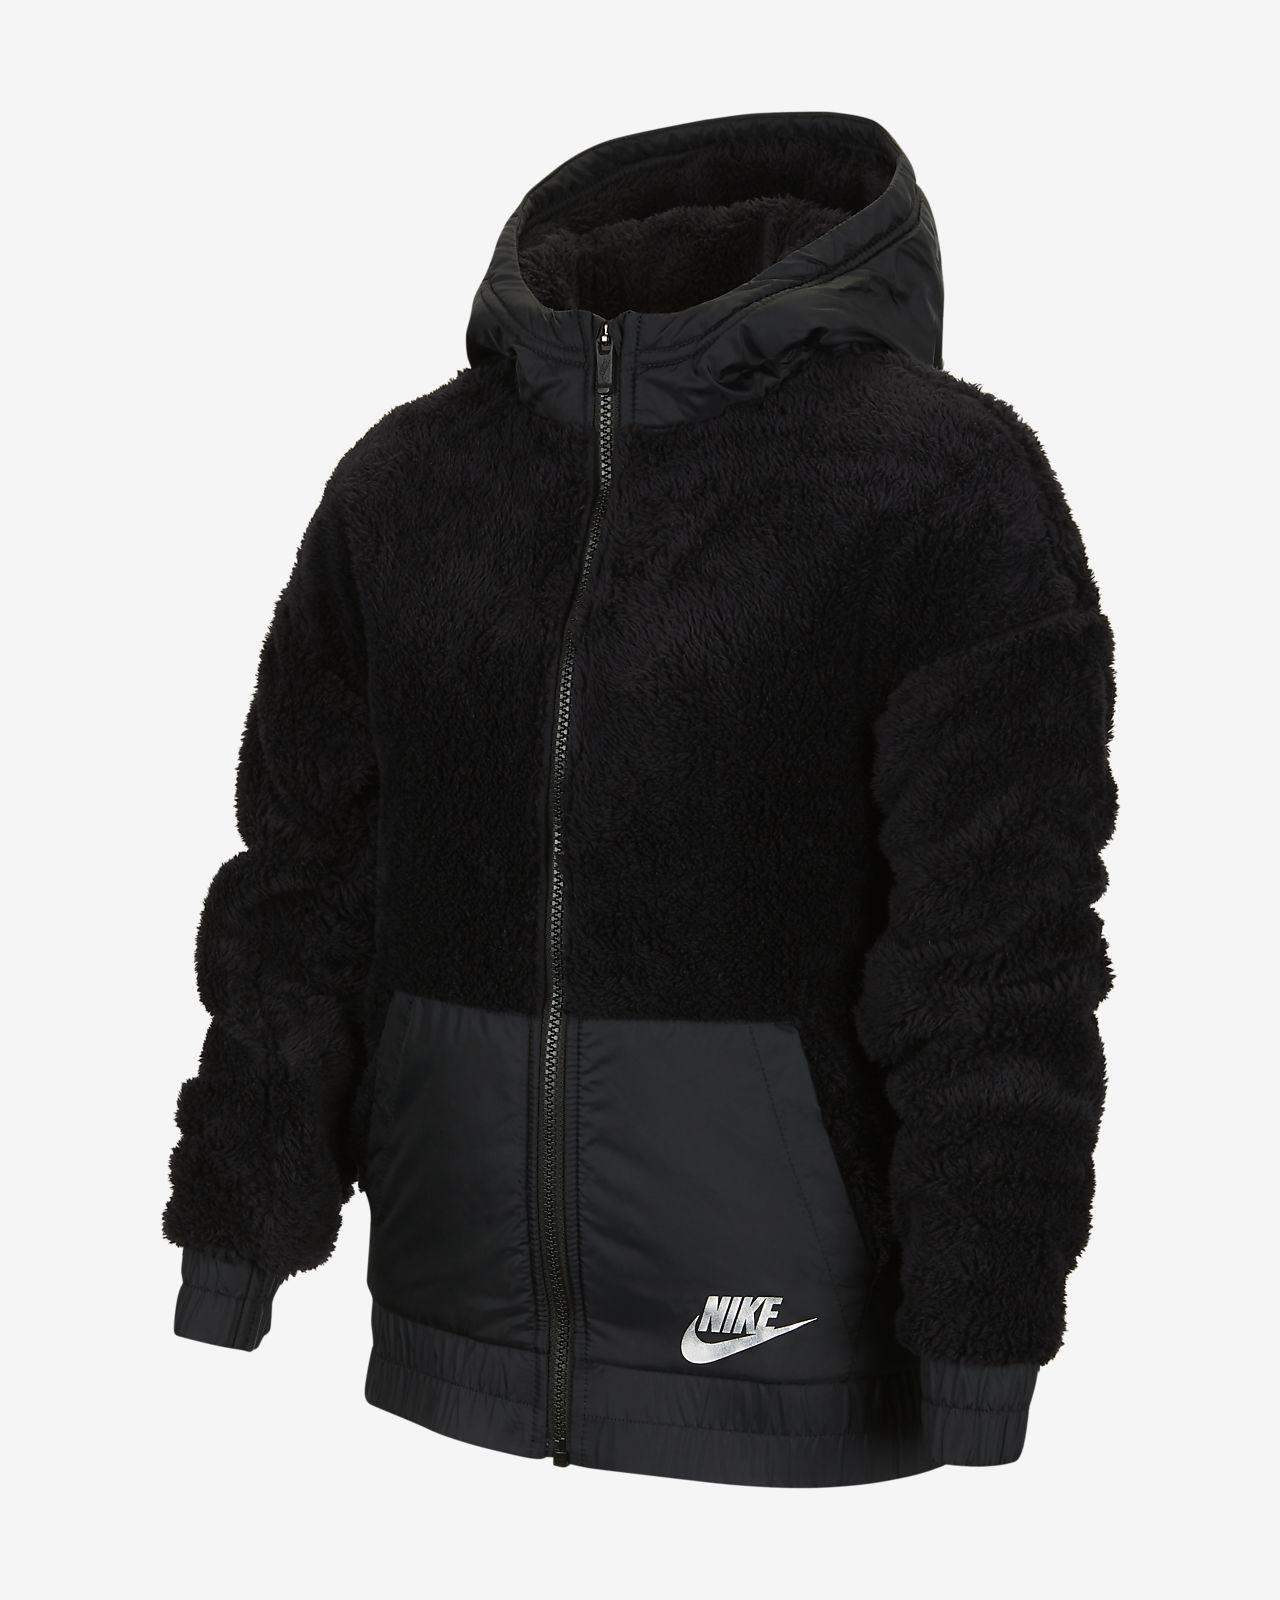 nike sportswear kinderjacke black white